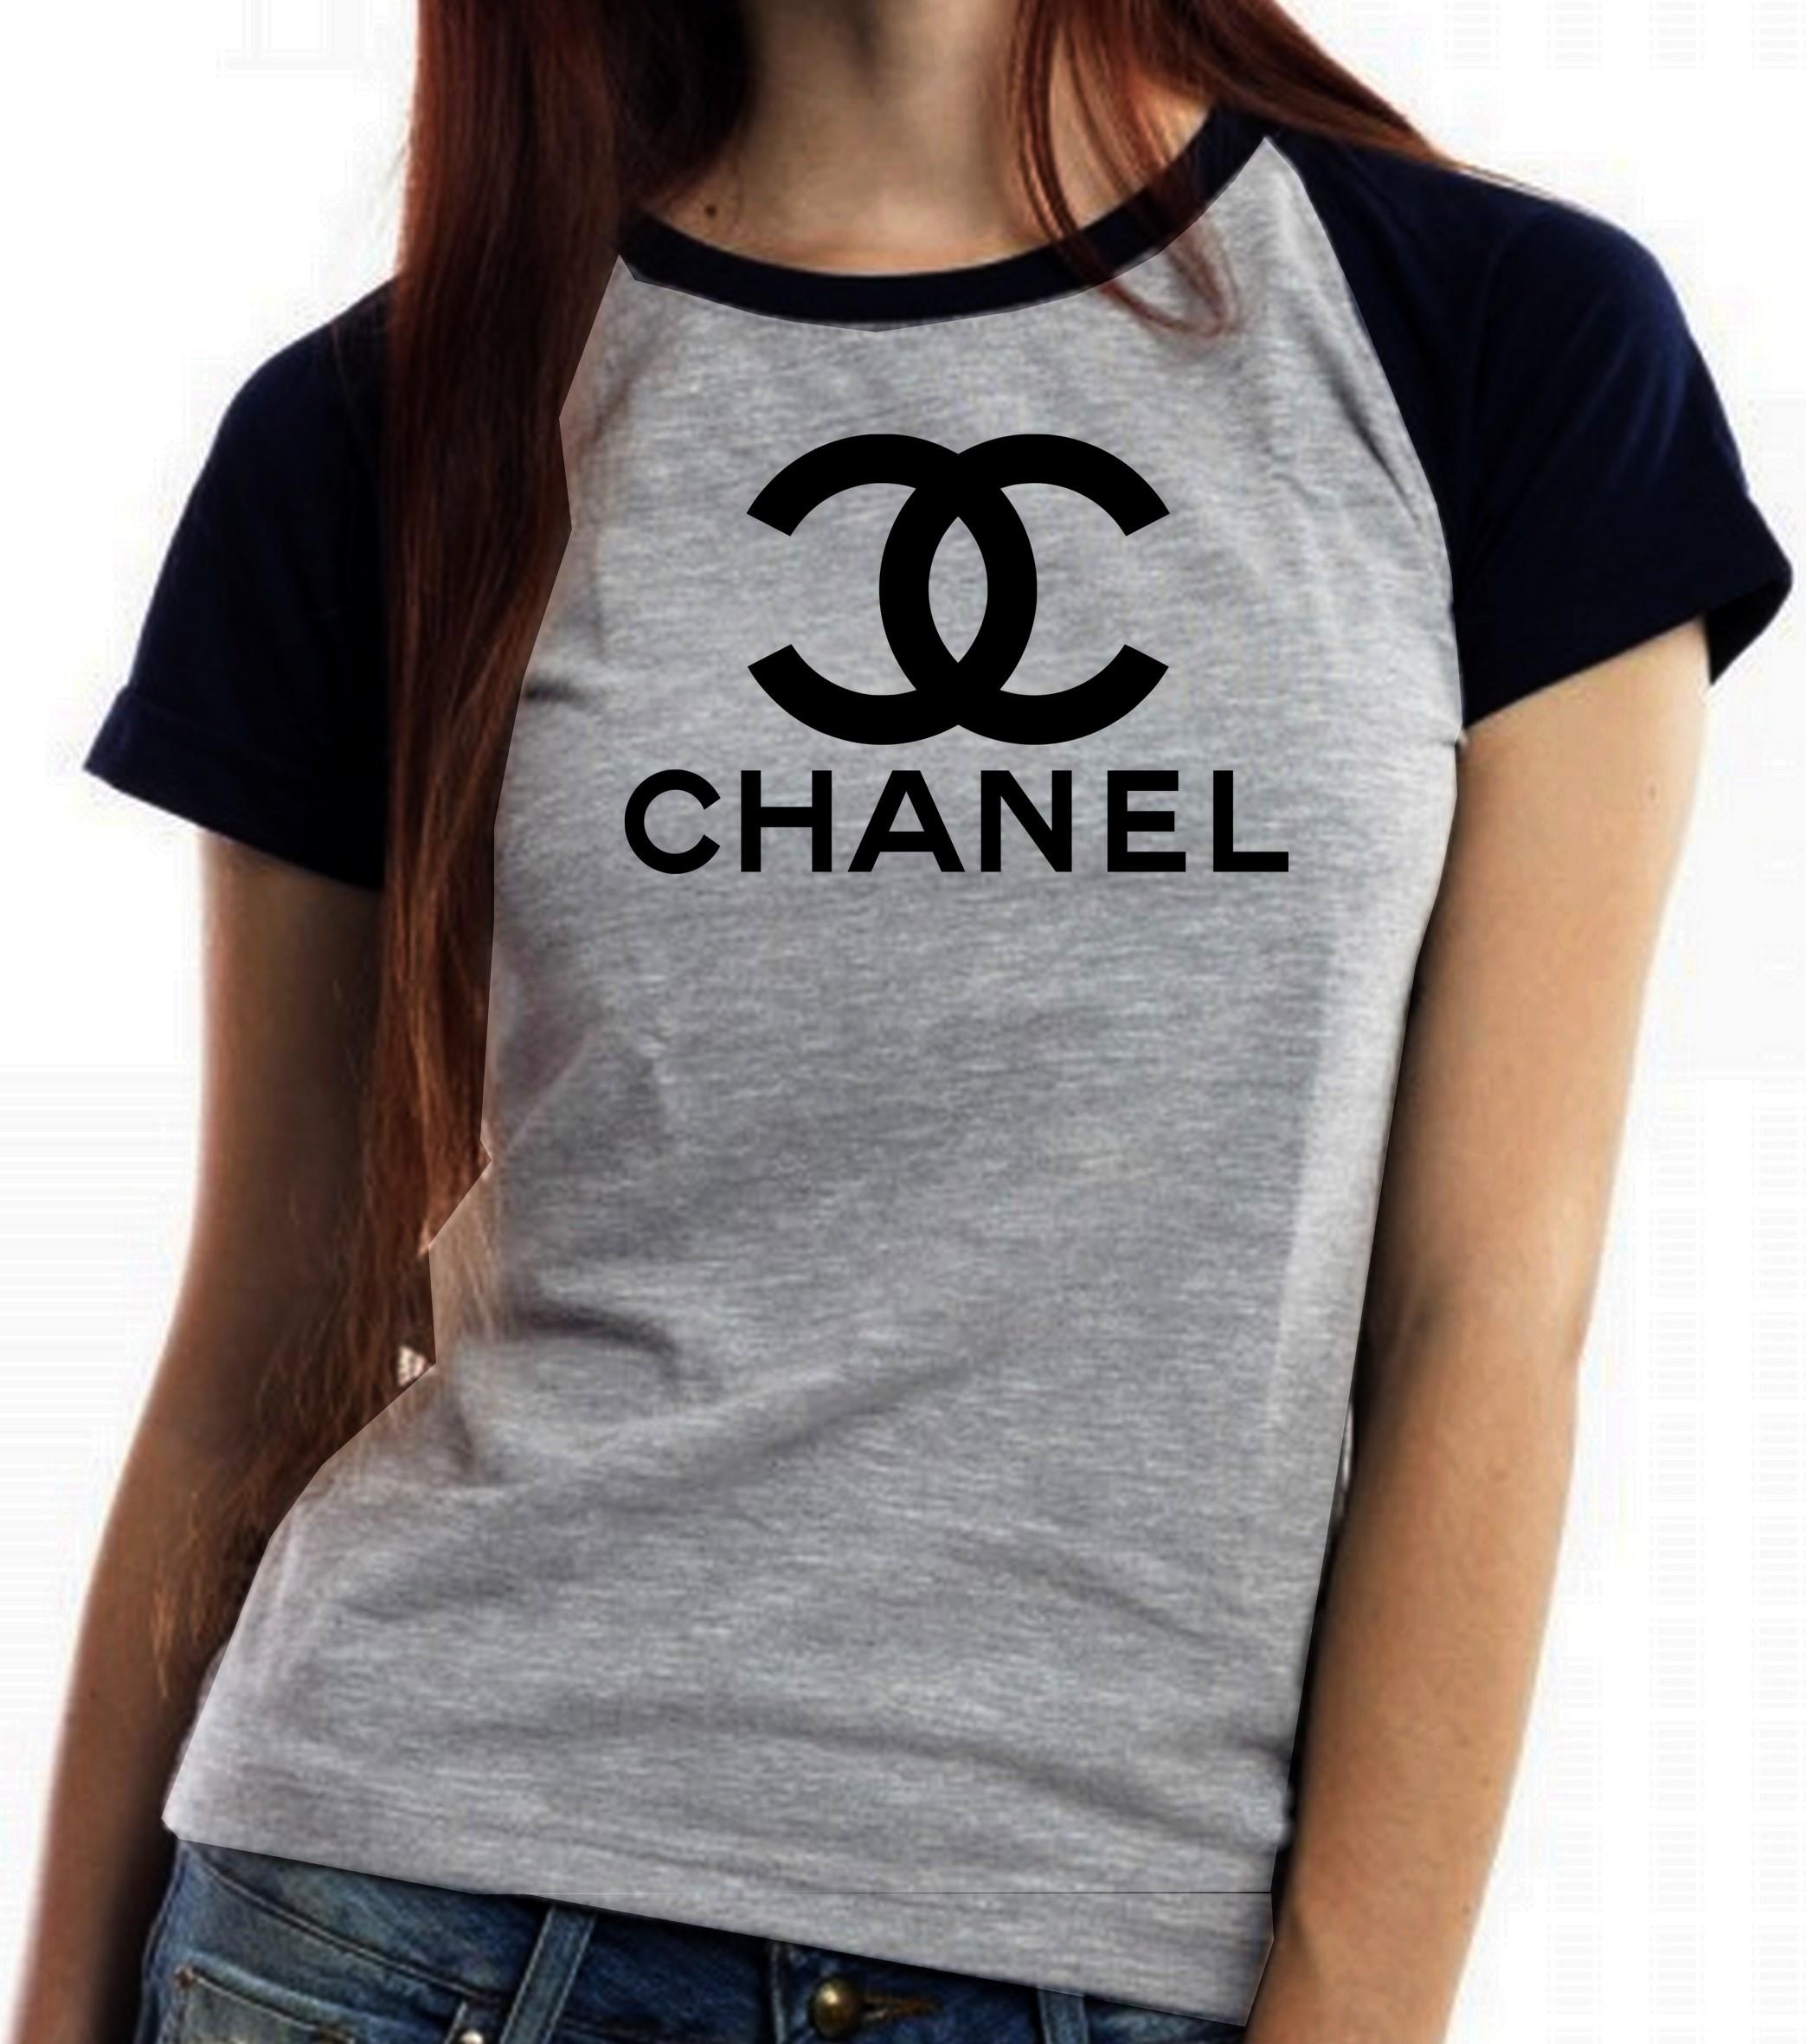 Boutique en ligne e7531 3c5a6 Blusa Chanel Bebe | Elo7